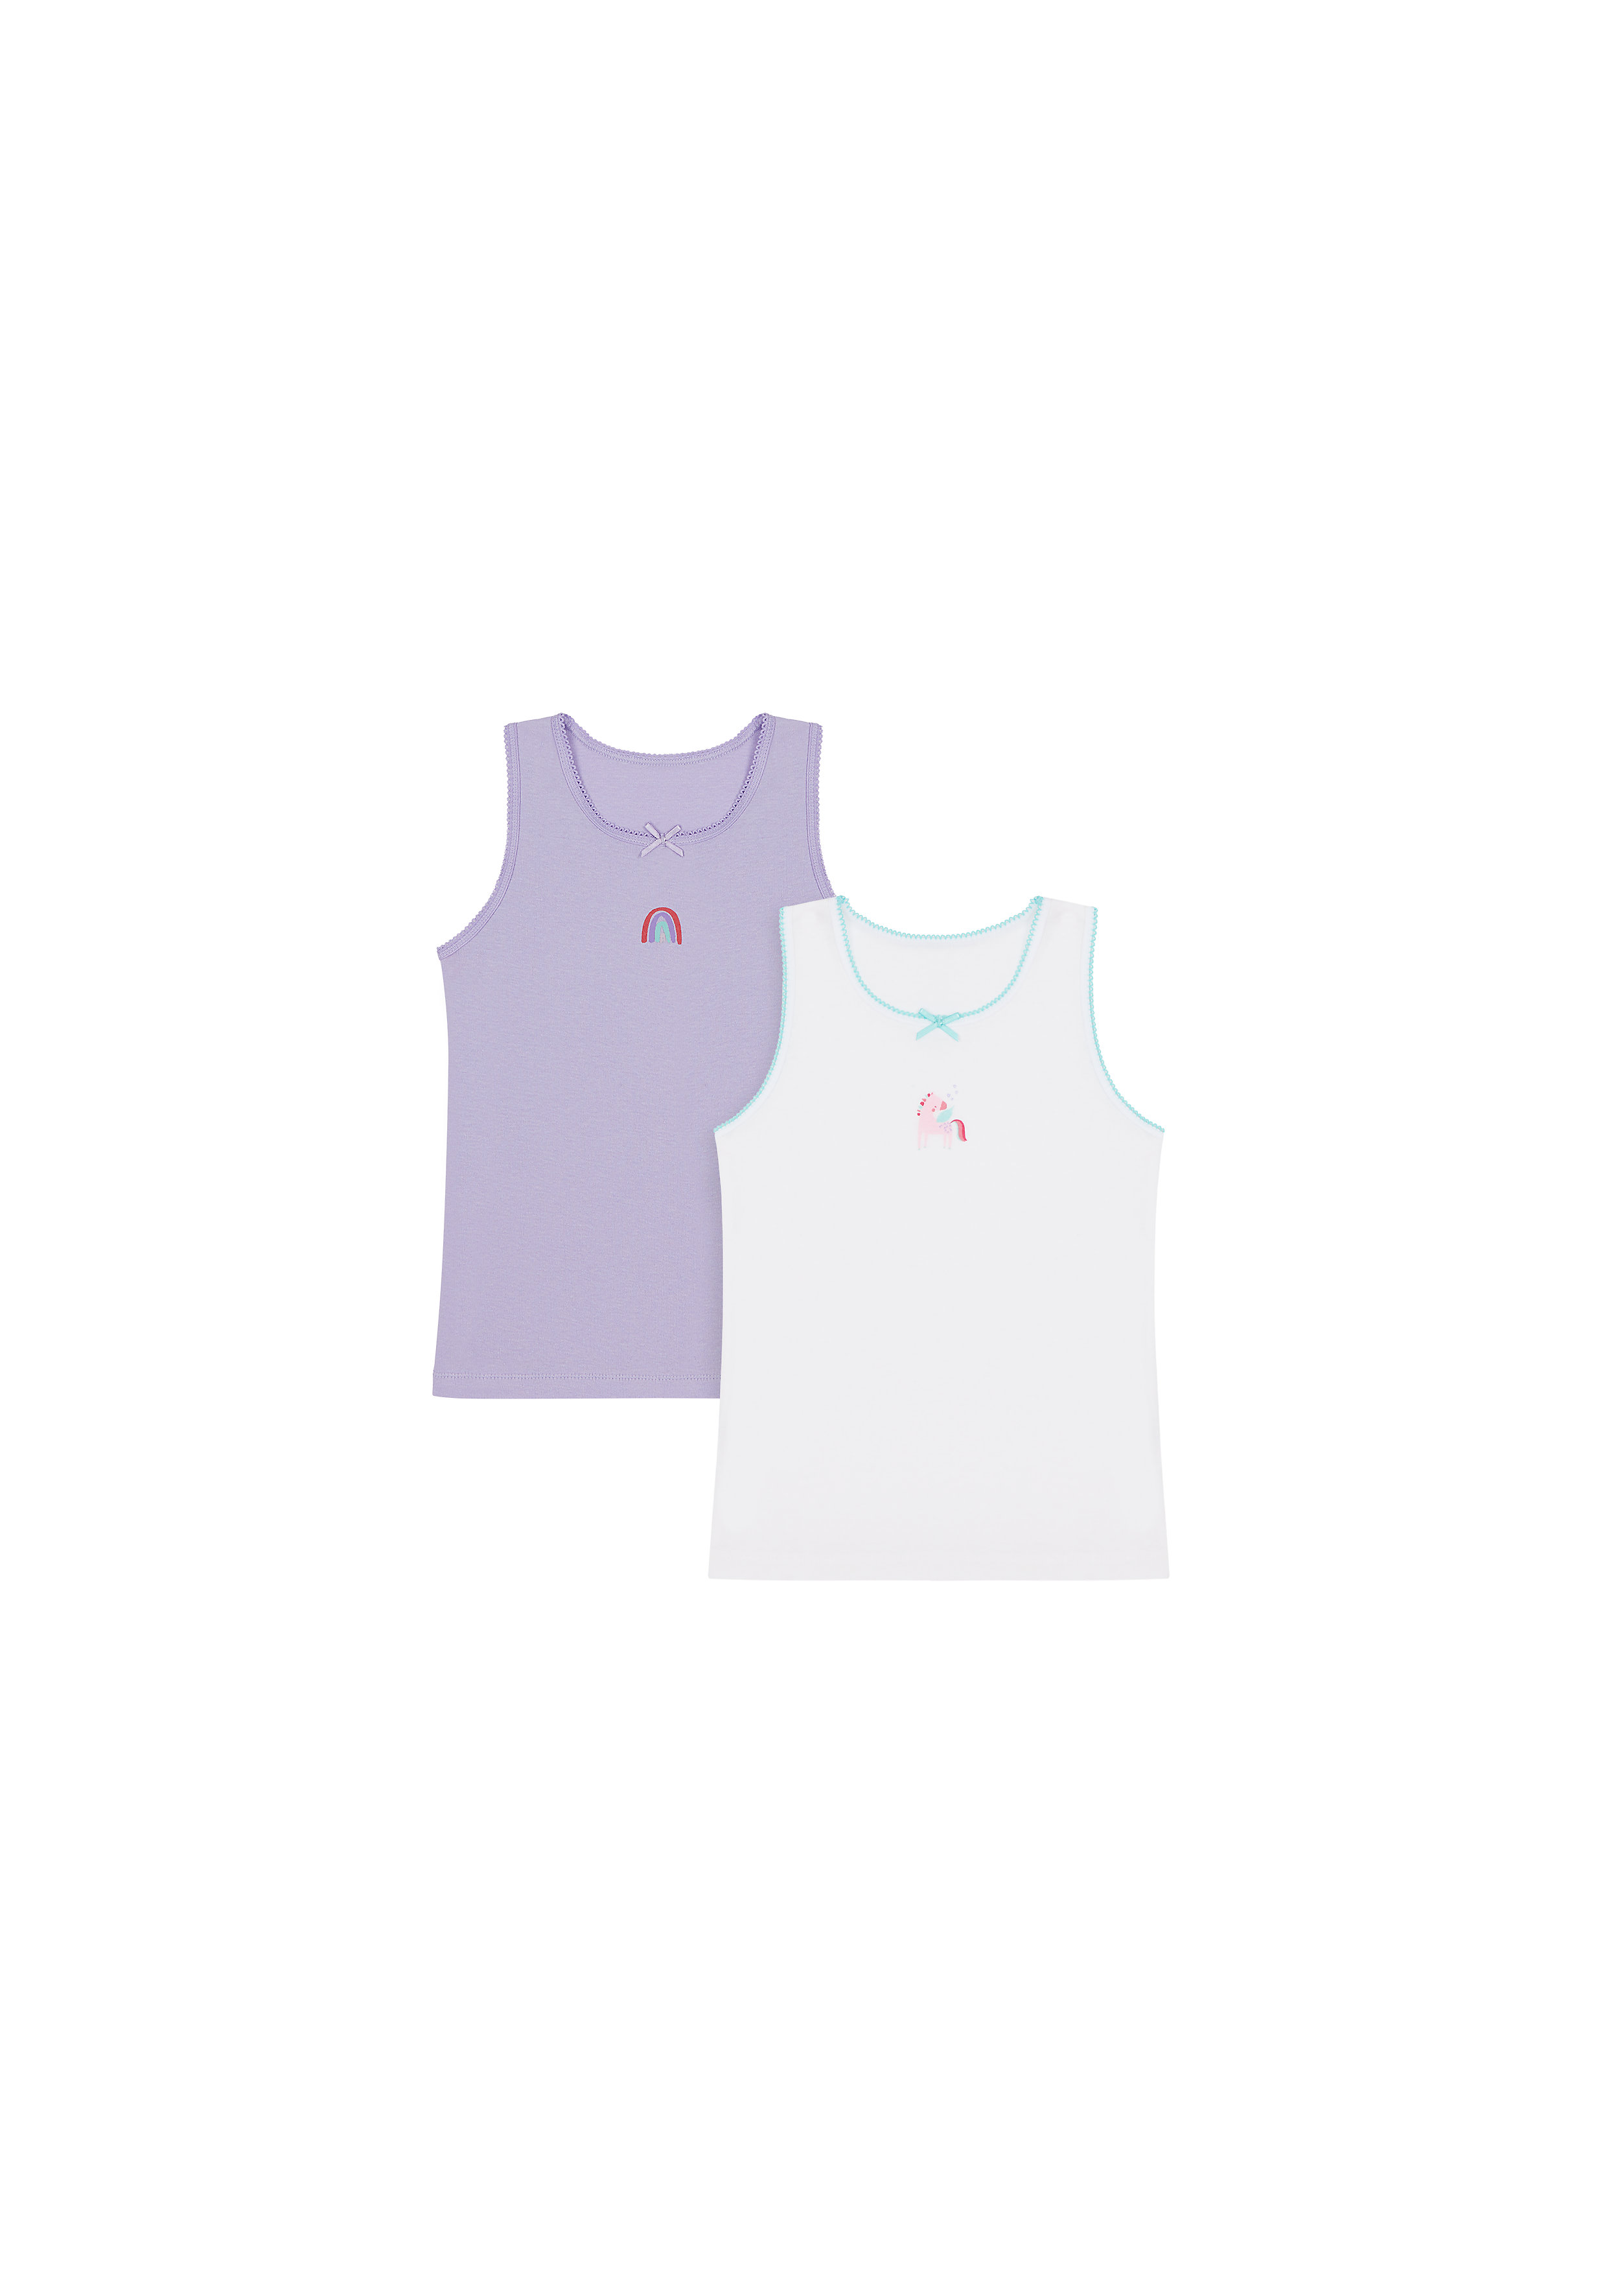 Mothercare | Girls Sleeveless Vest Unicorn Print - Pack Of 2 - Purple White